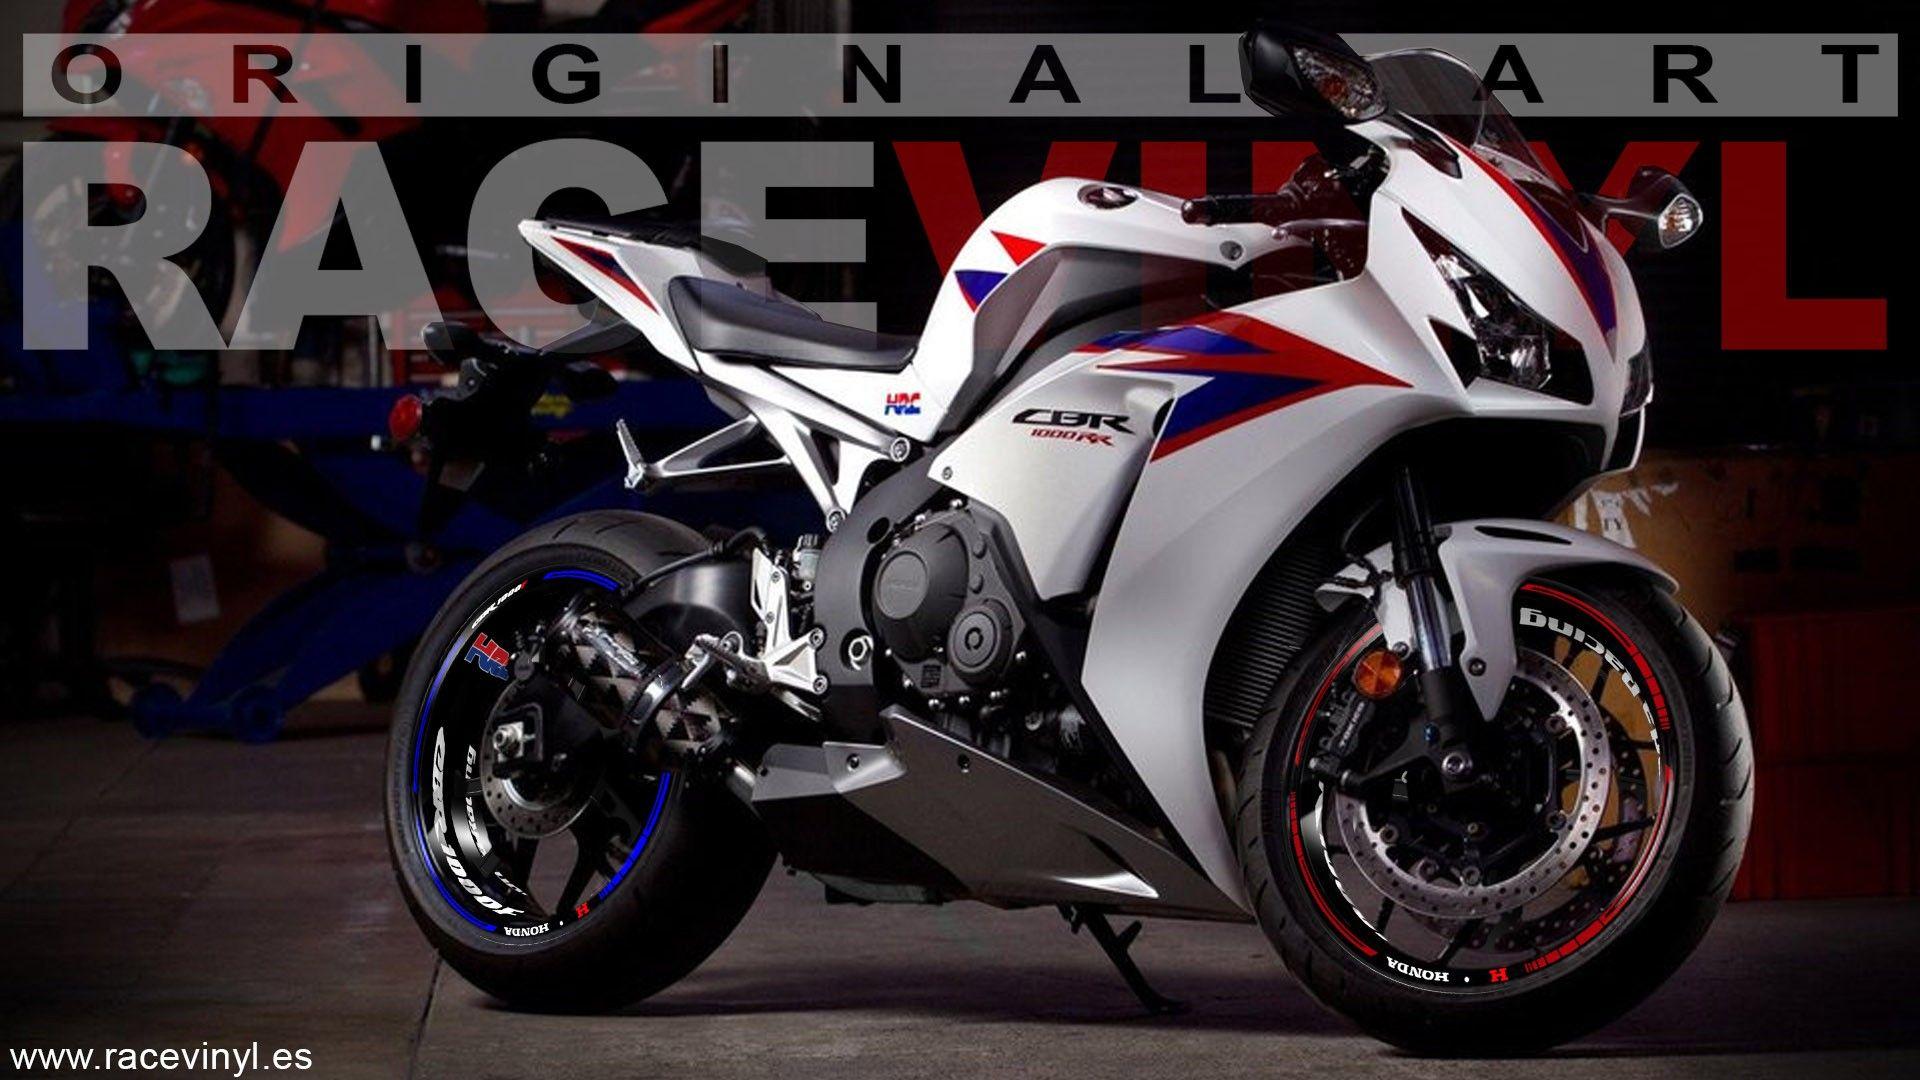 Honda-CBR-1000RR-pegatinas-para-llantas-KIt-PRO-HRC-Racing-bicolor